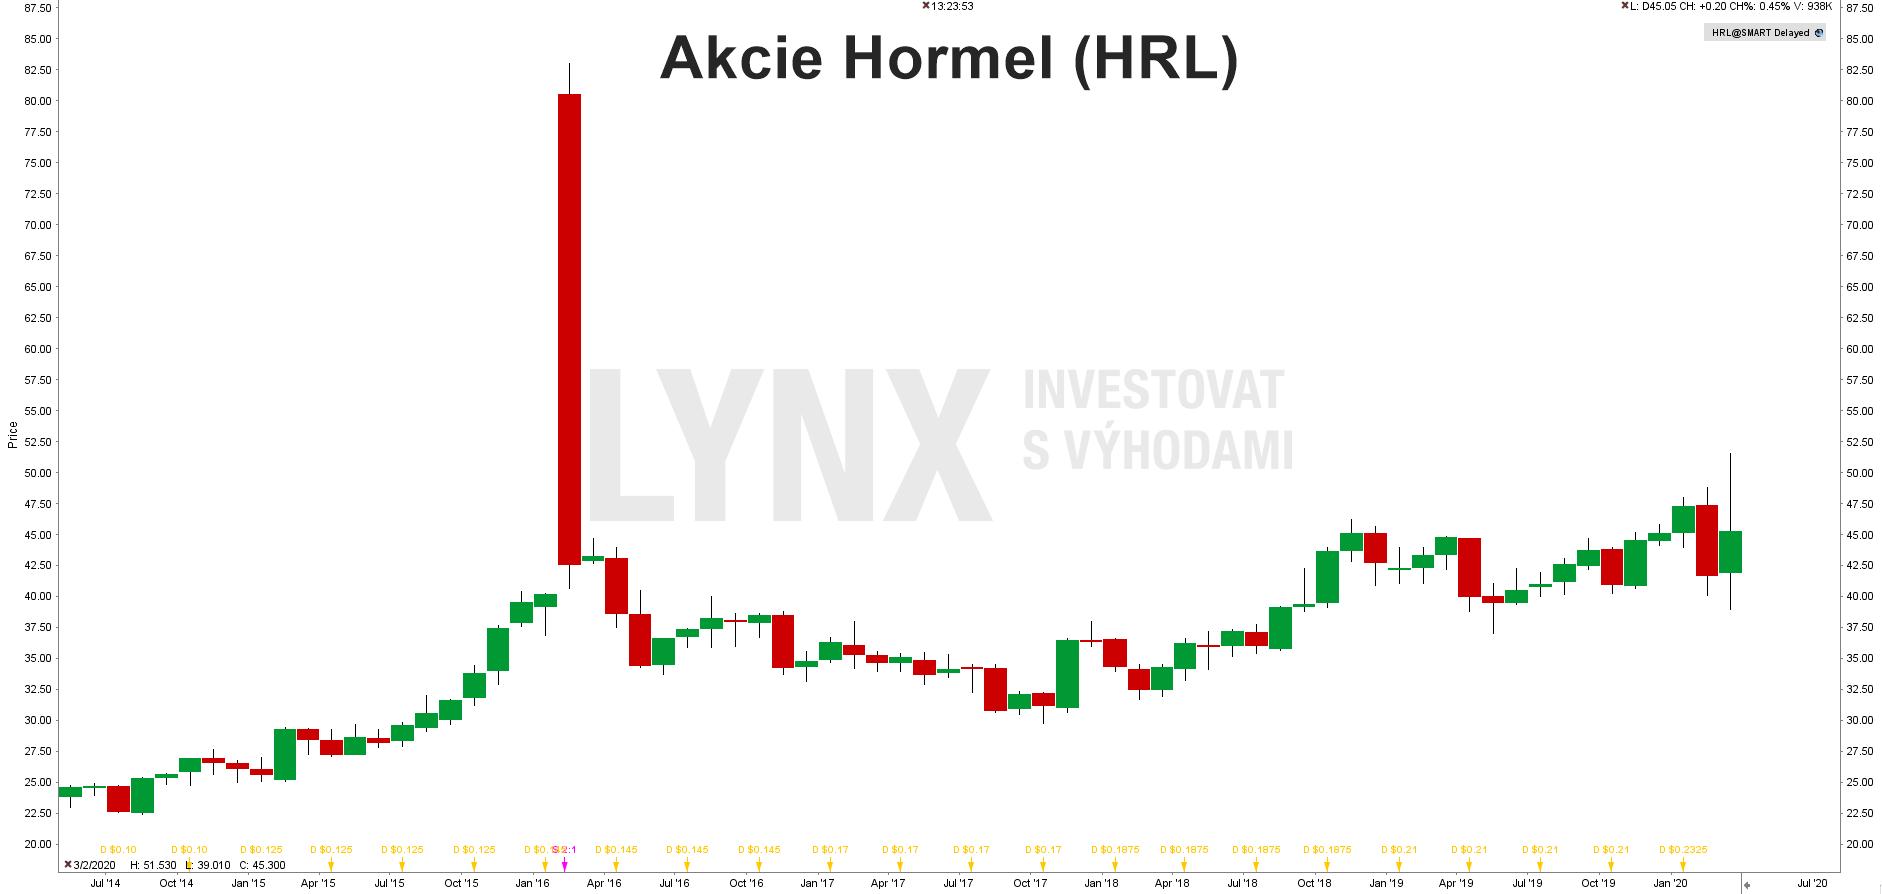 Akcie Hormel (HRL)